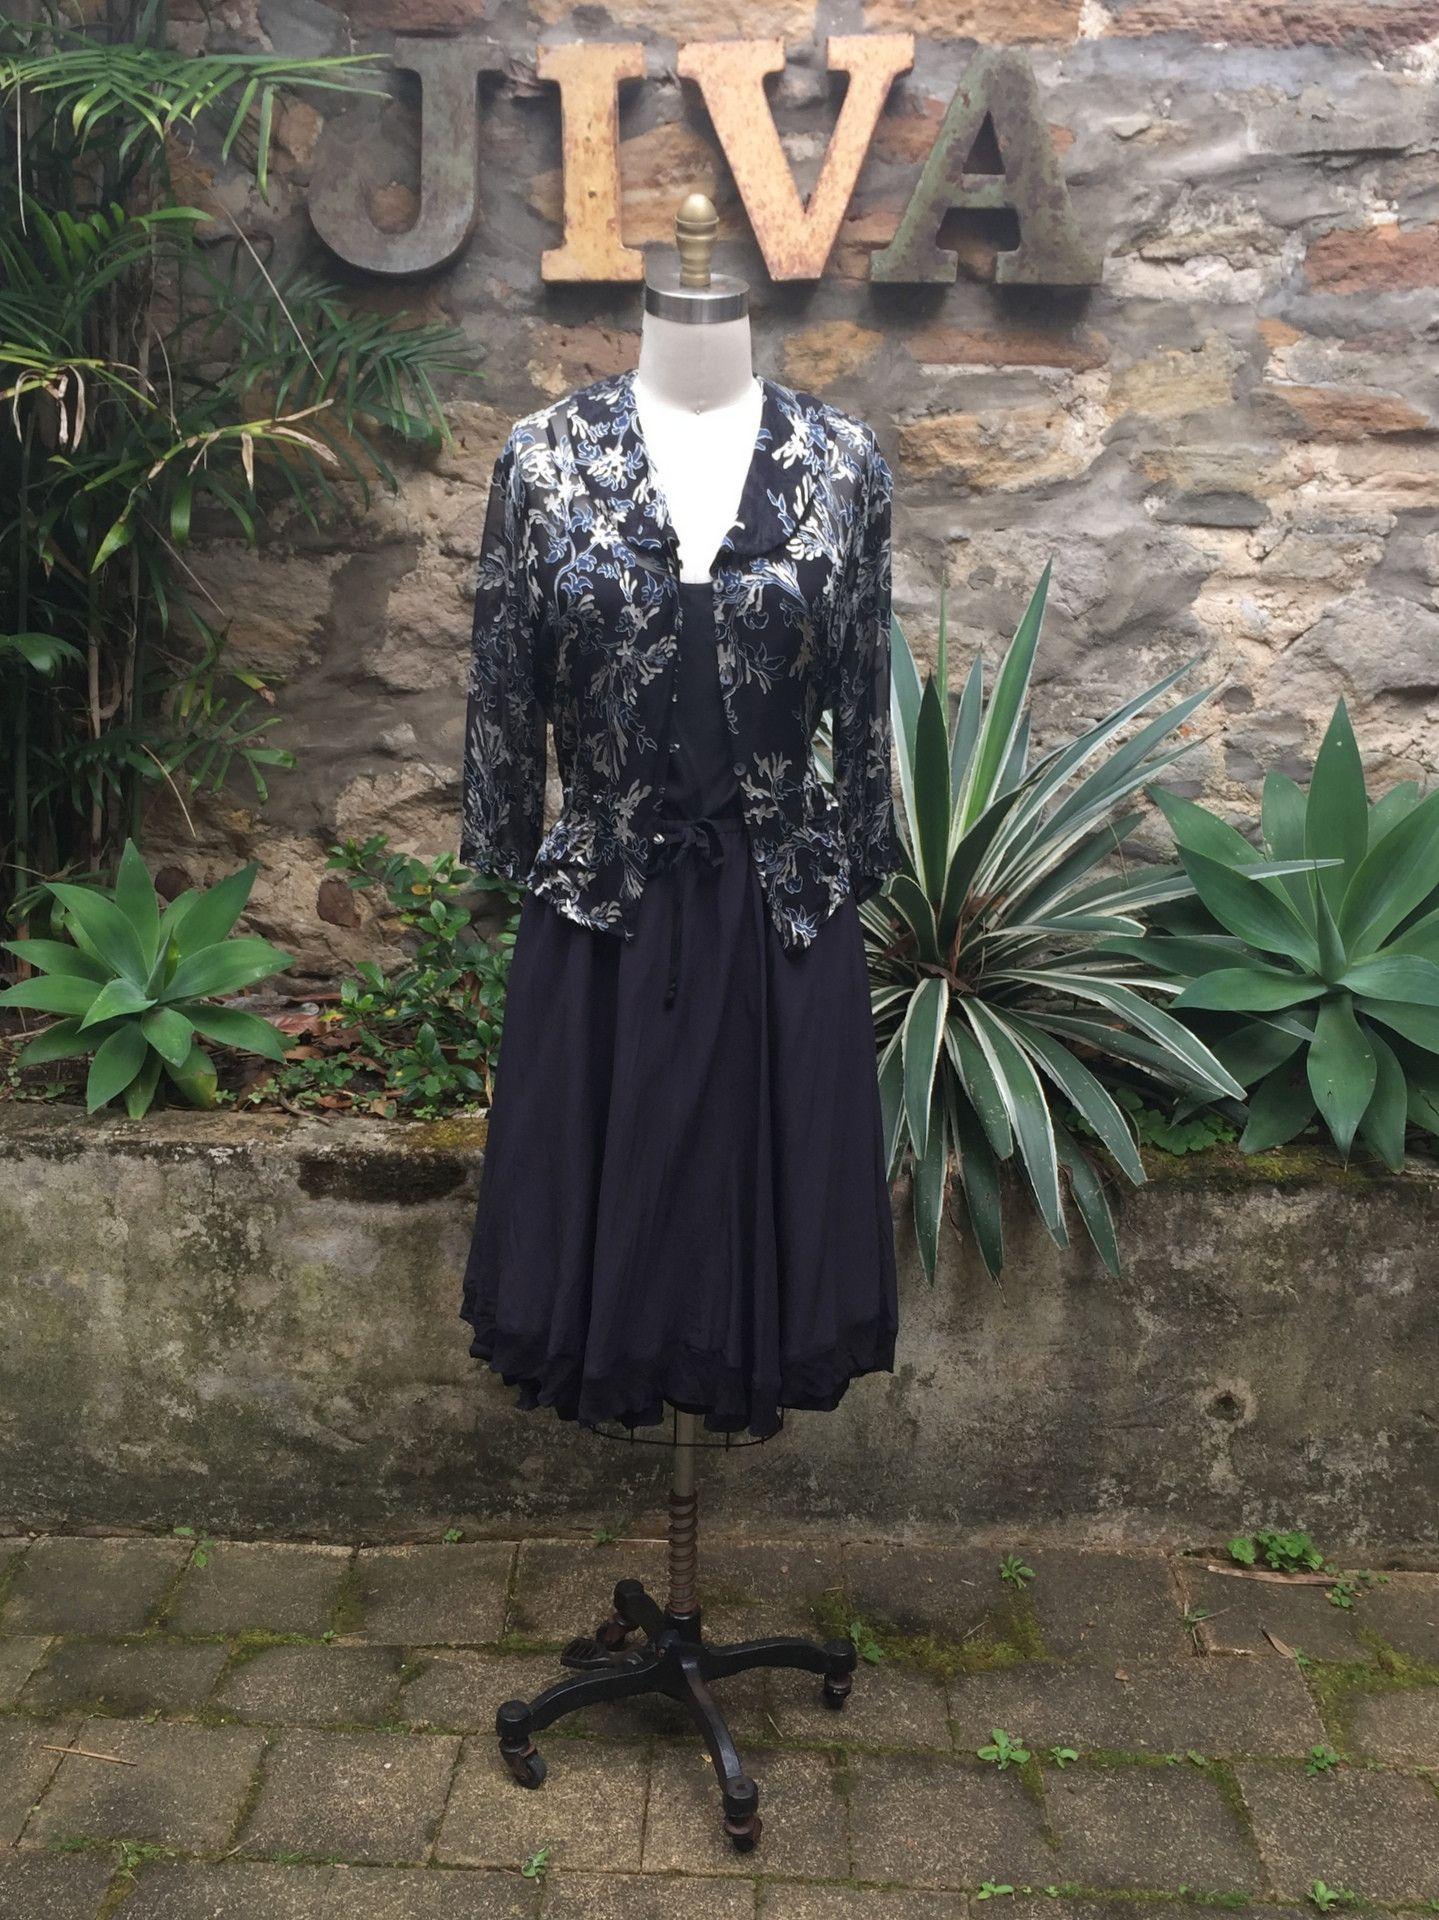 2c3afcdcb8 Jiva Lucy Shirt - Silk Silver and Navy Burnout – Jiva Clothing Sydney  Australia